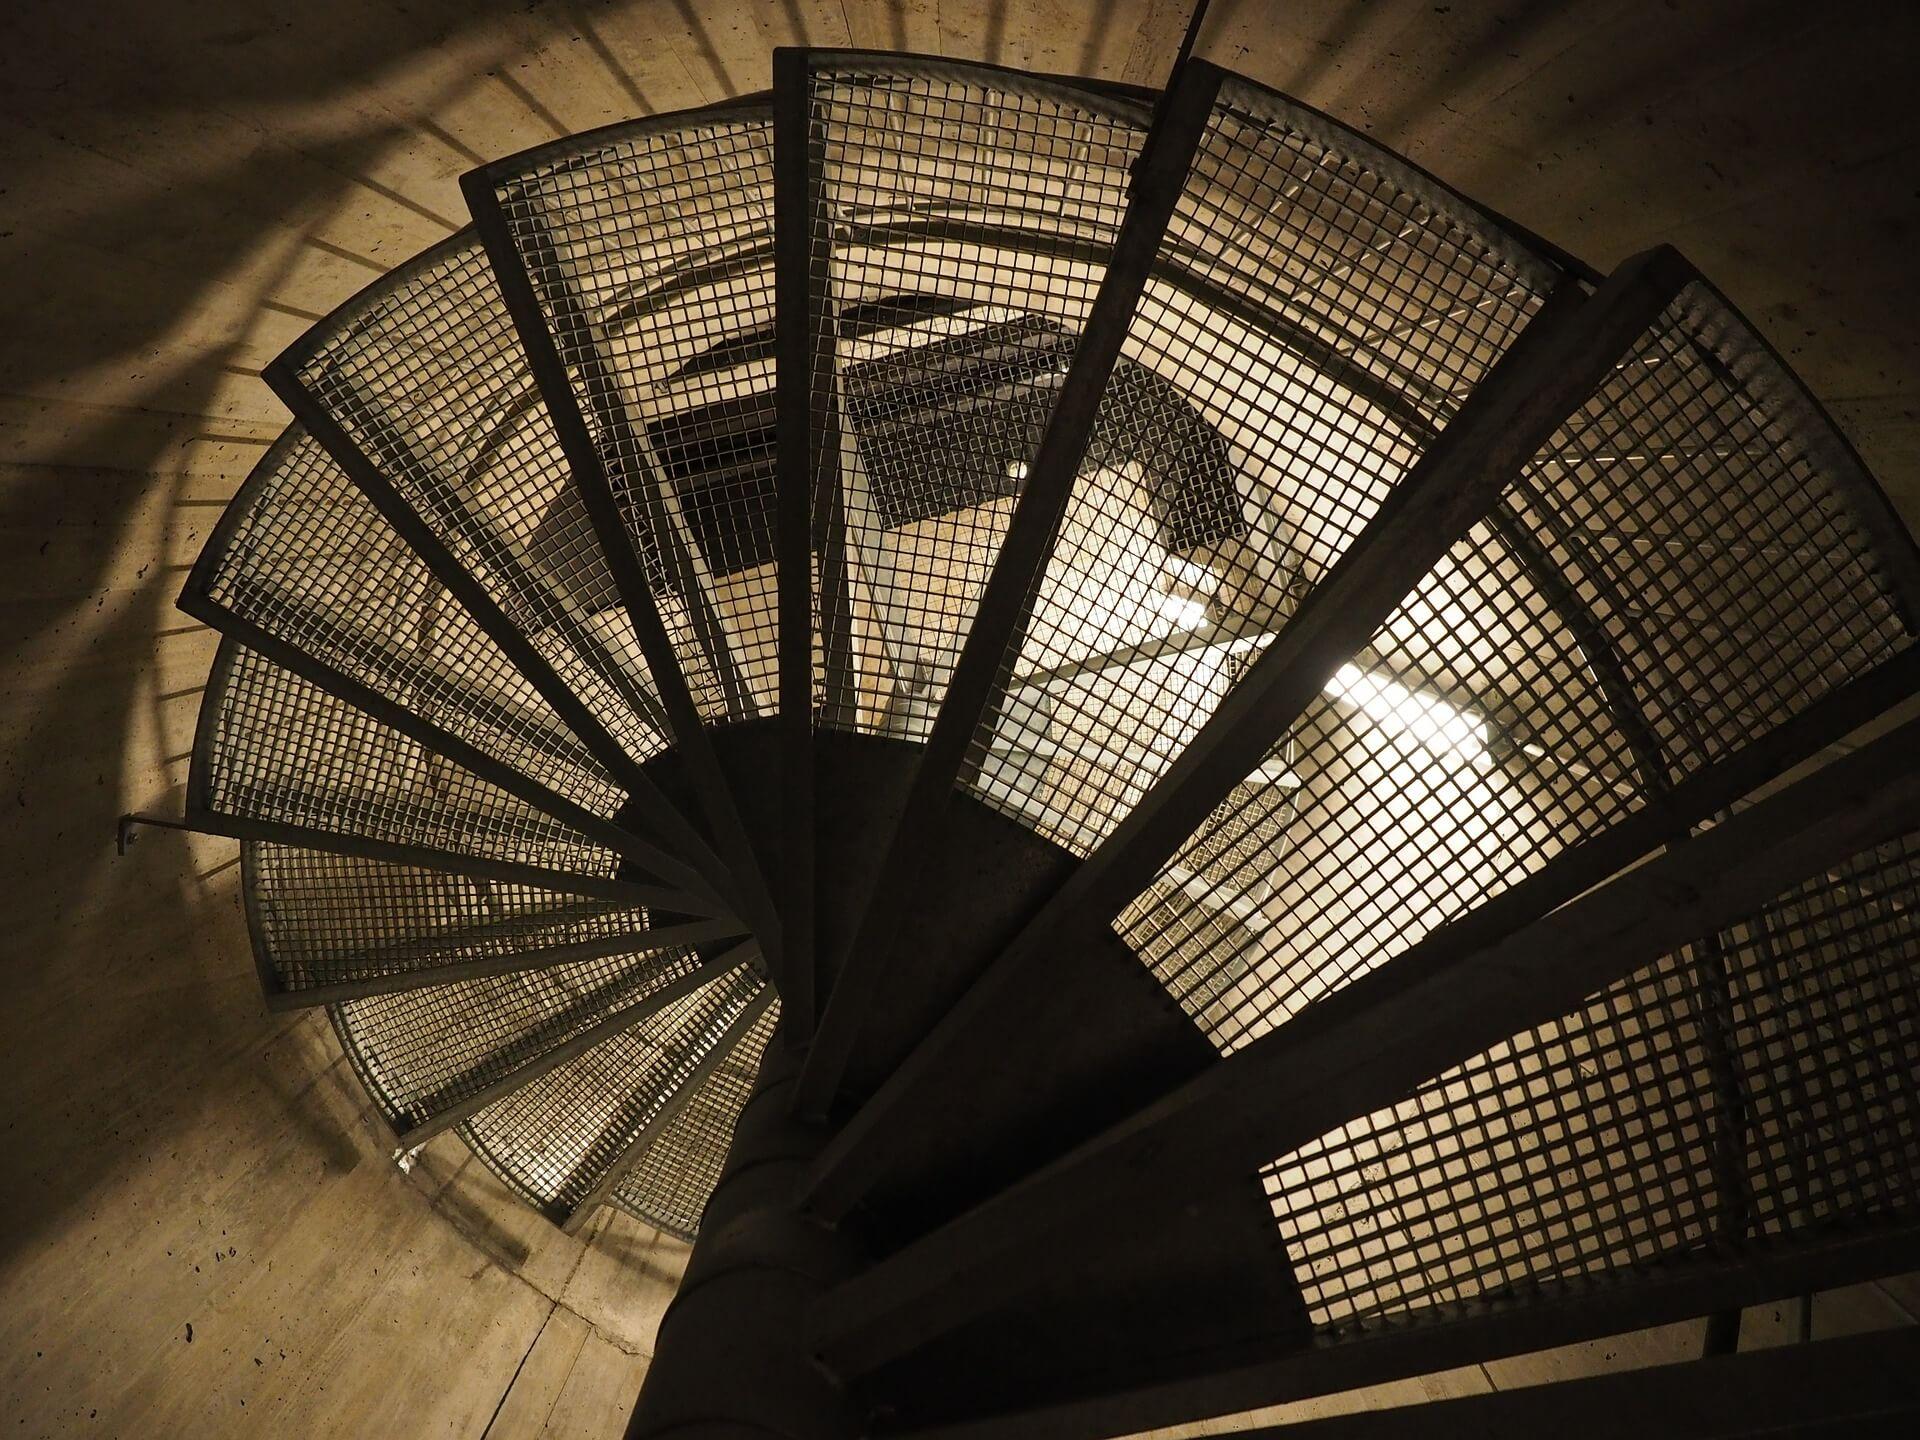 Spiral Staircase 505975 1920